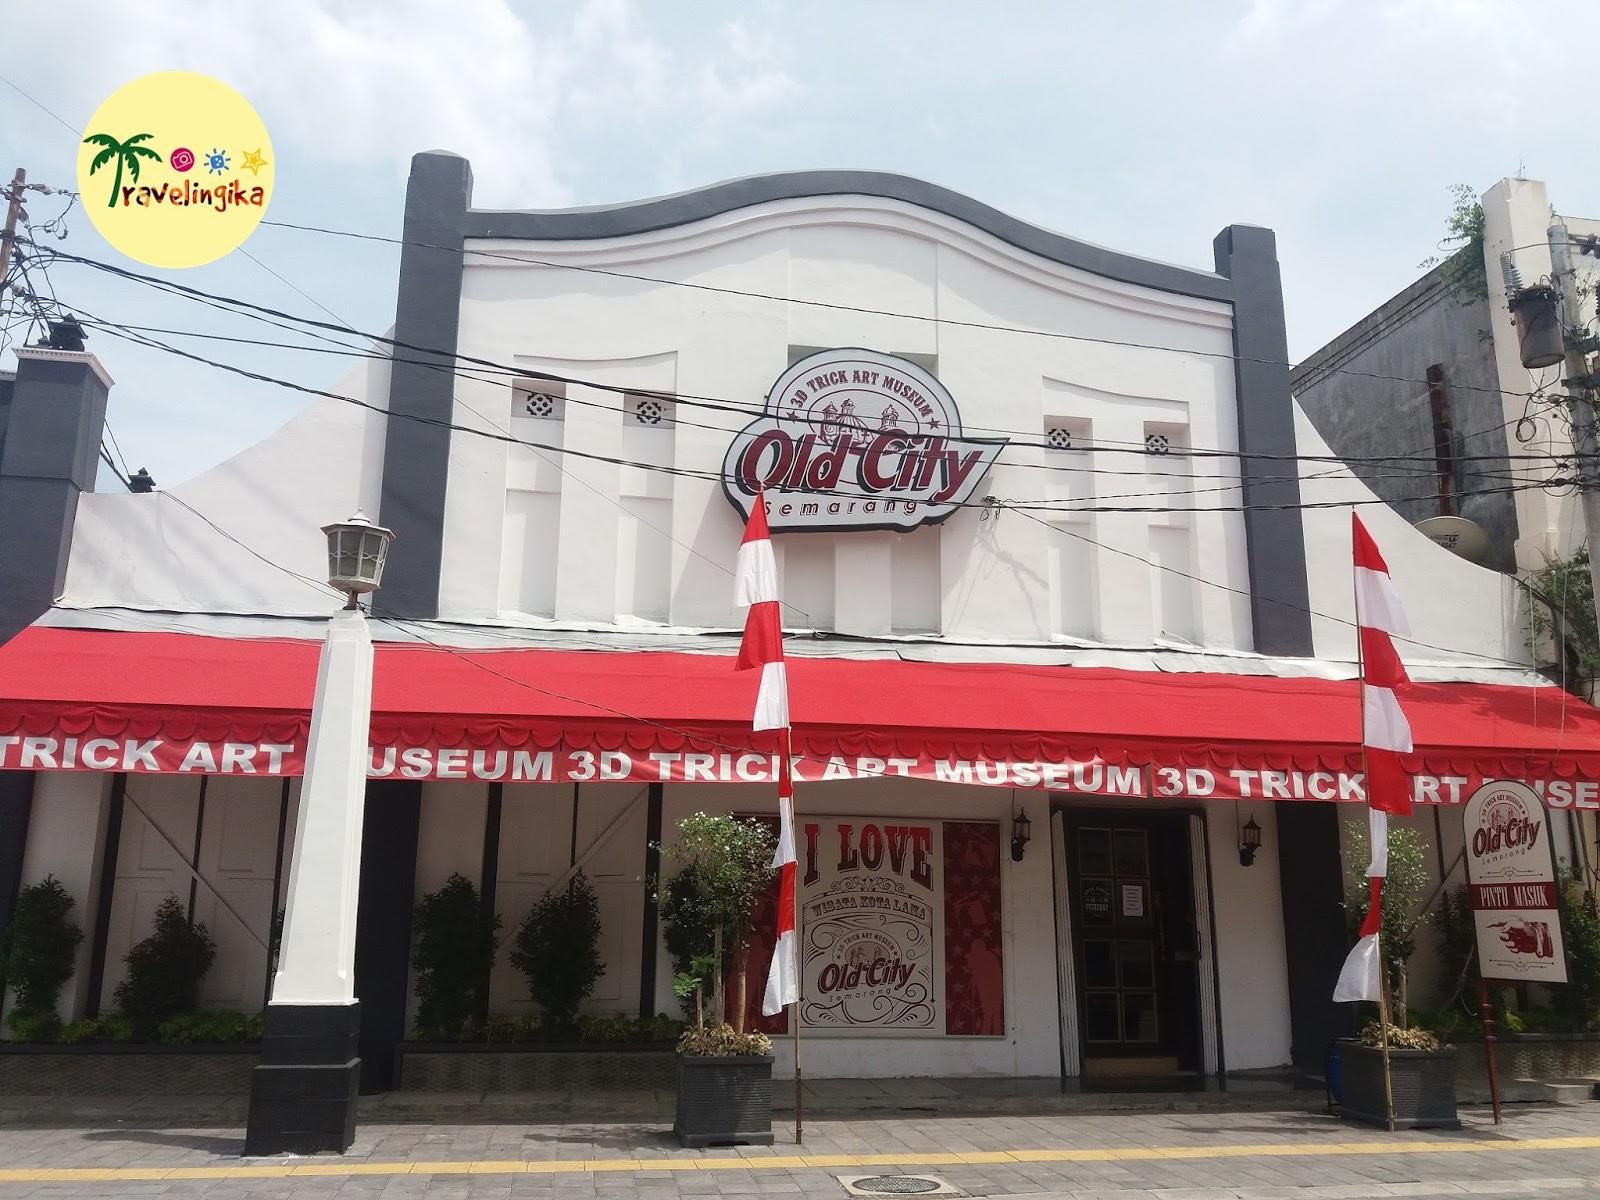 Serunya Wisata Selfie City 3d Trick Art Museum Semarang Kawasan